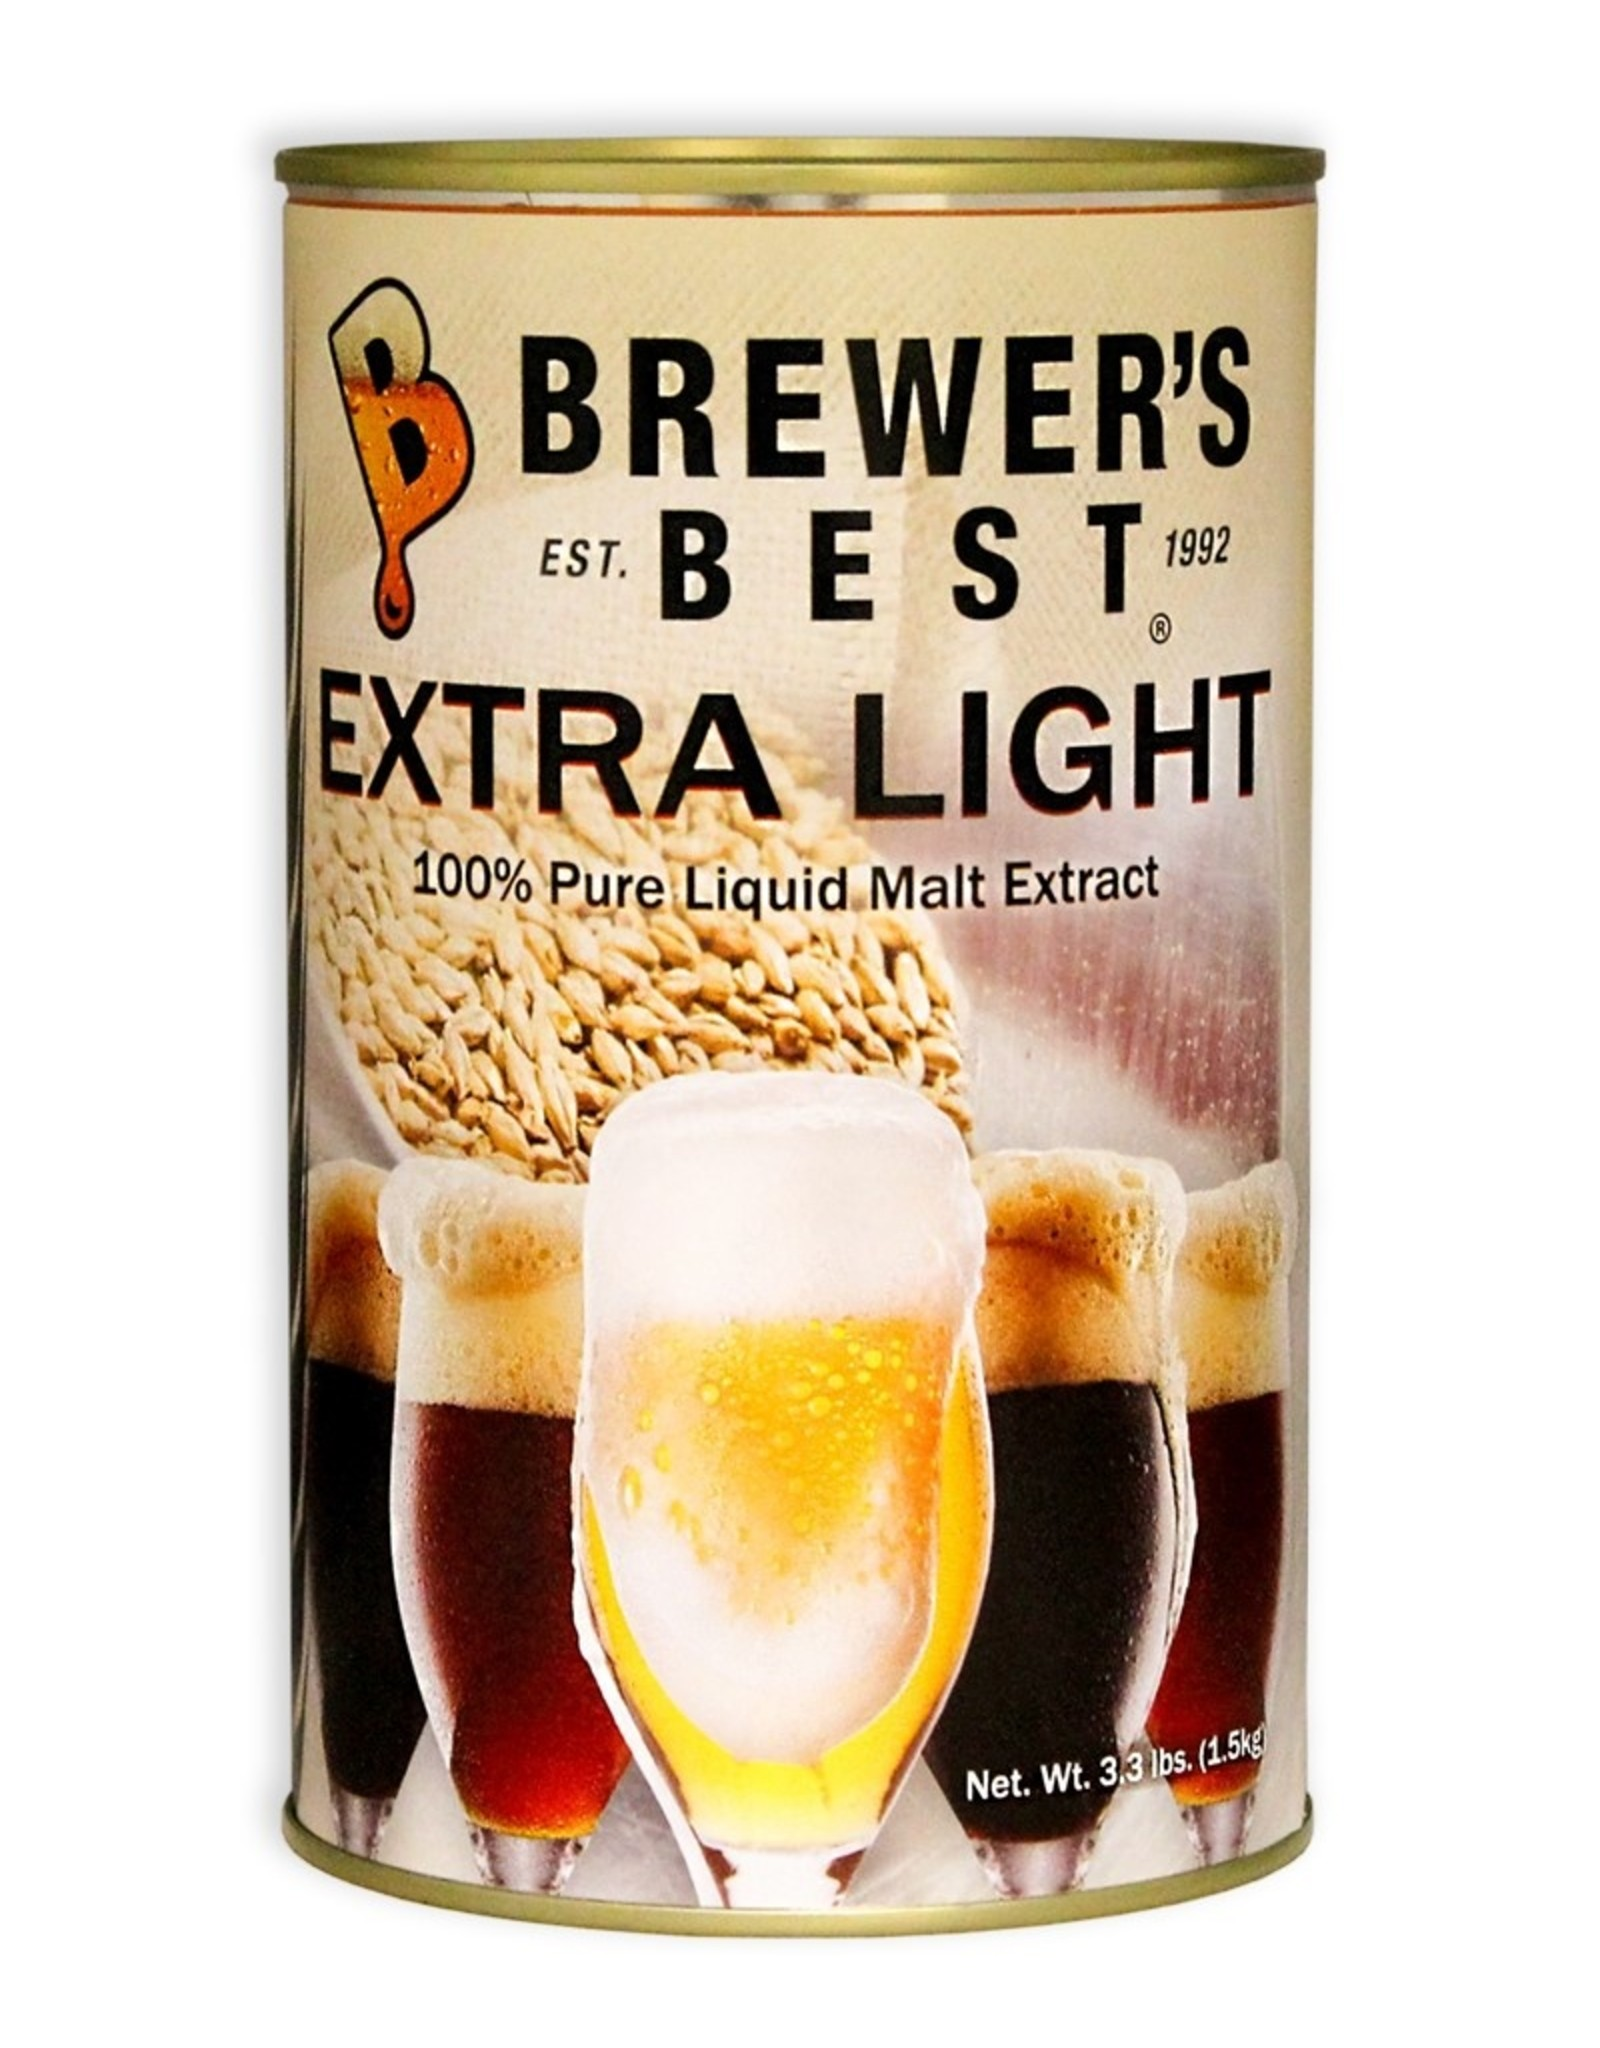 Brewer's Best Extra Light Liquid Malt Extract 3.3 lb Tin